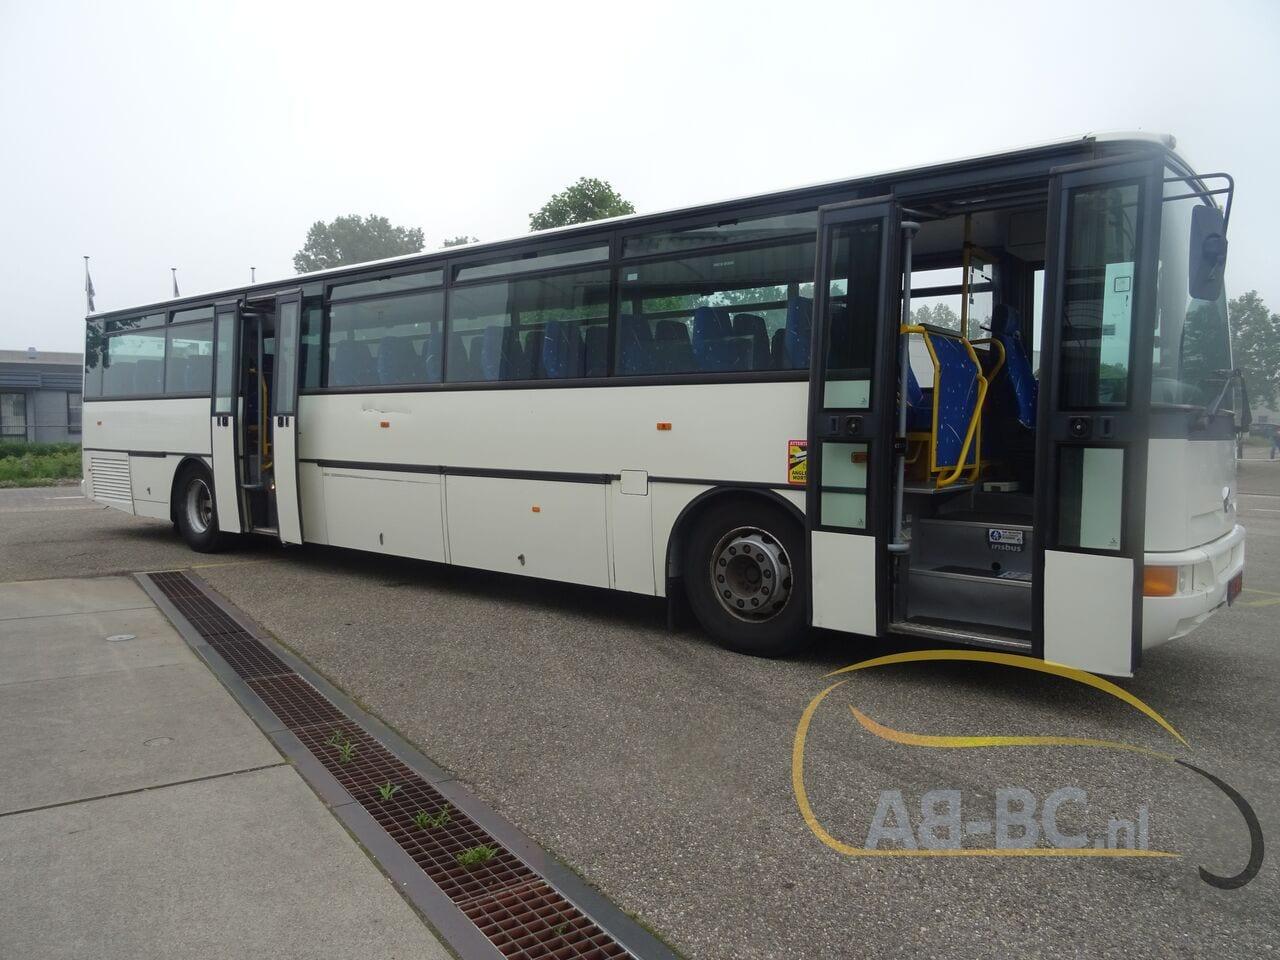 interurban-busIVECO-Irisbus-Recreo-64-Seats---1626159837776182343_big_ae75606439541db2887ba9711d77ab60--21071309575983154500